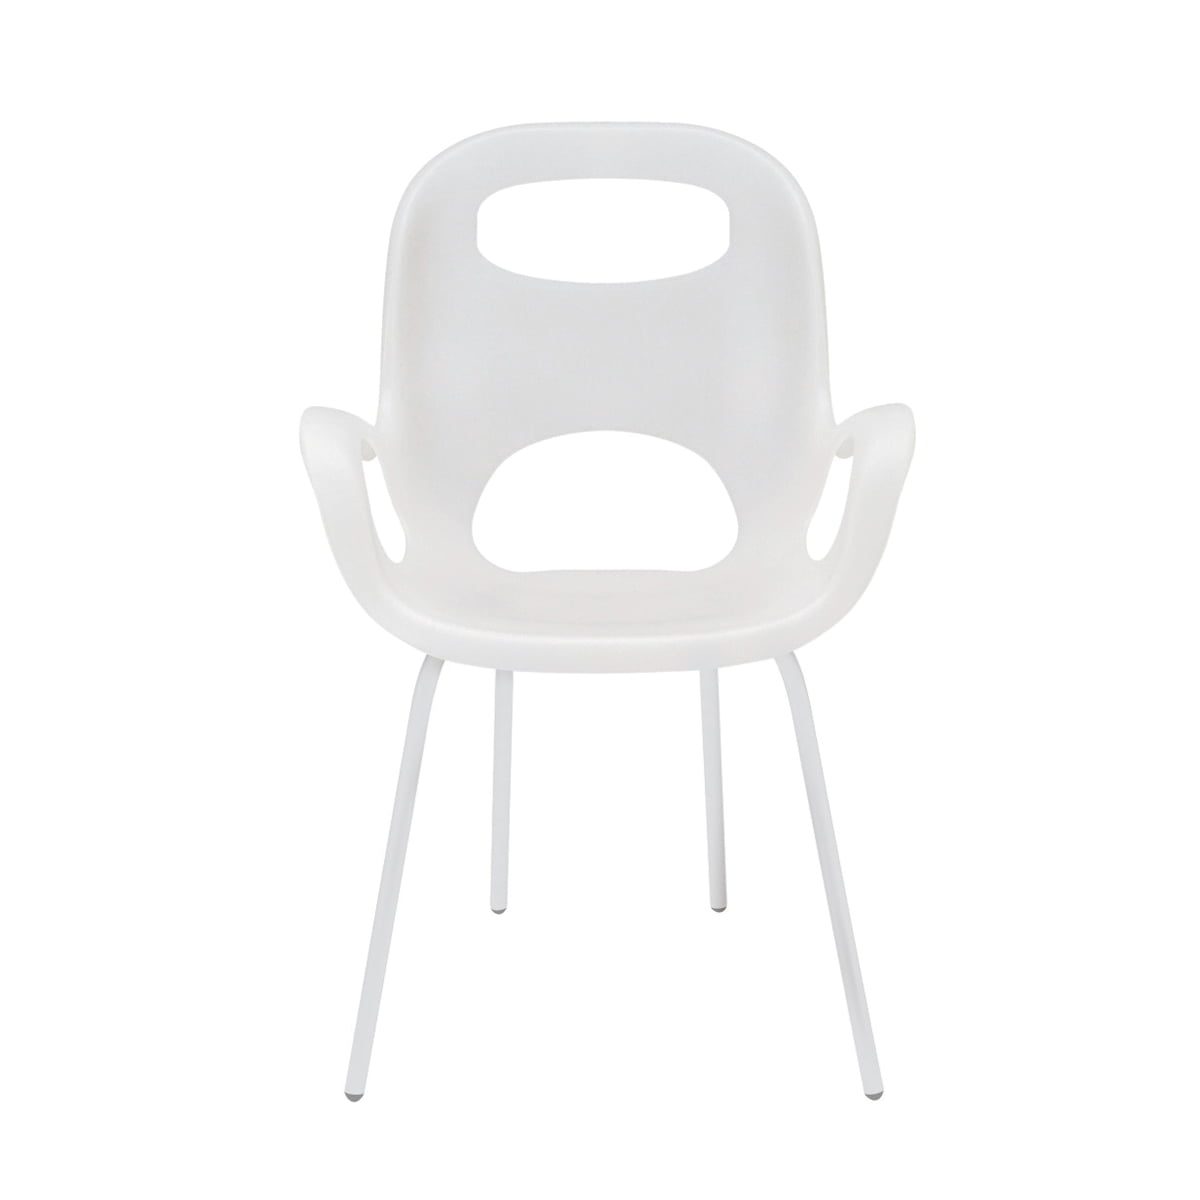 Umbra   Oh Chair, White